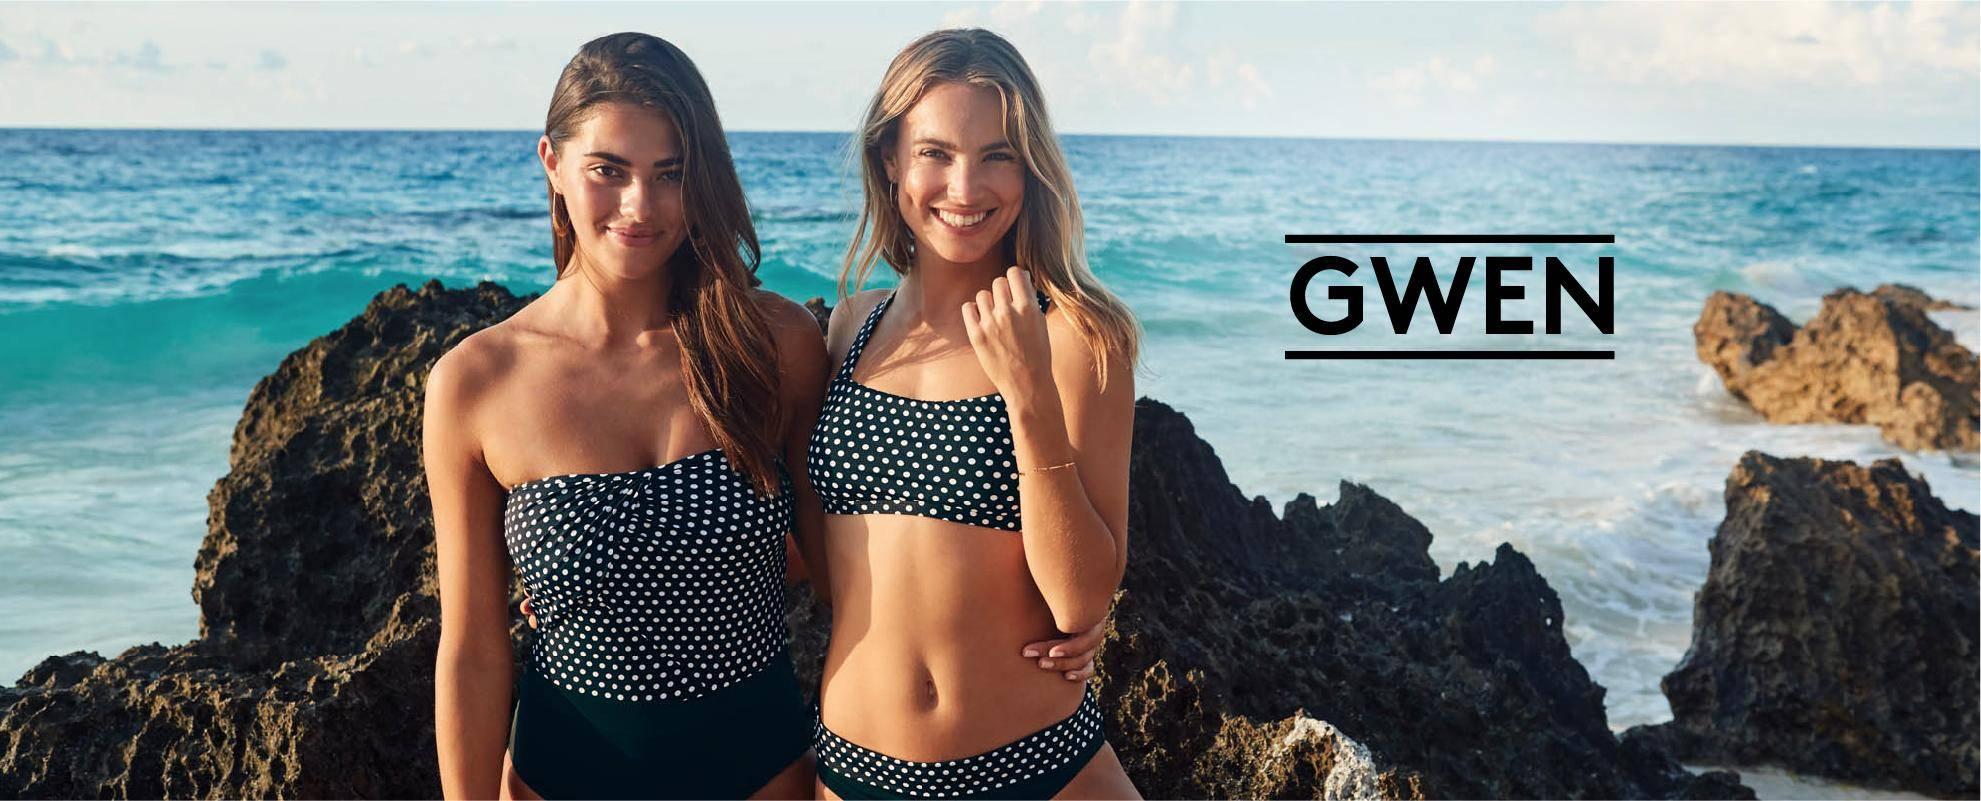 Shop SKYE's Gwen Collection